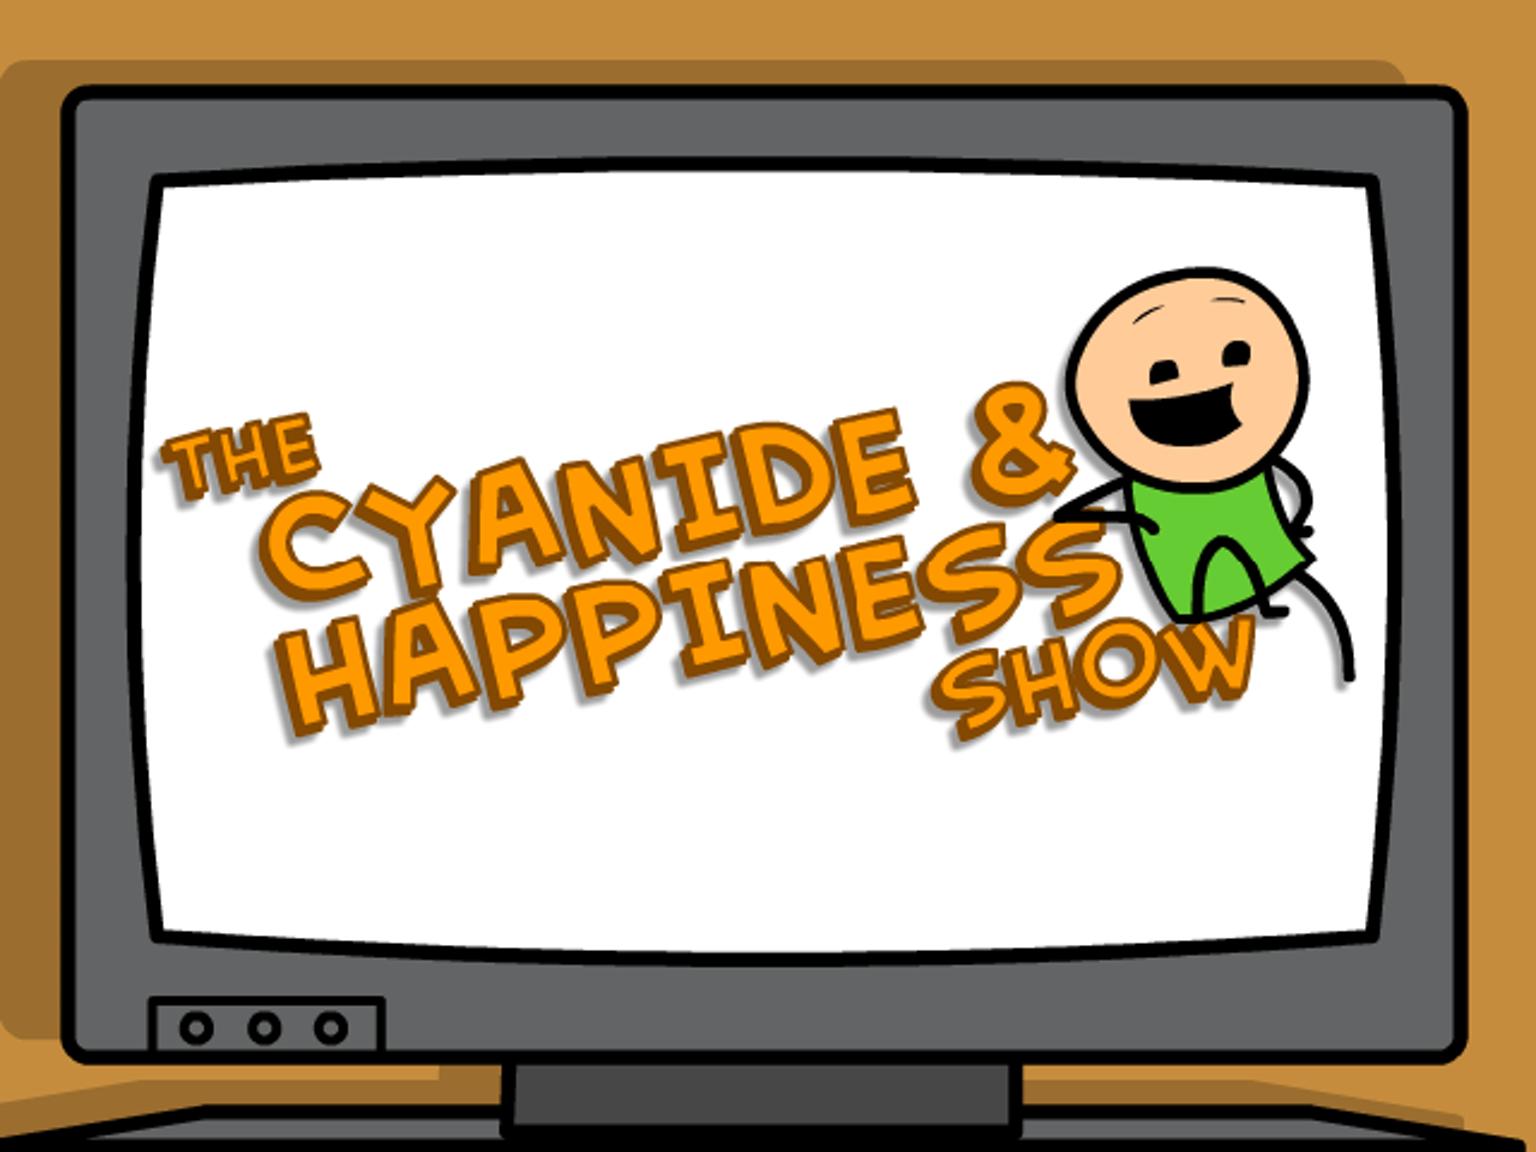 The Cyanide & Happiness Show: Season 1